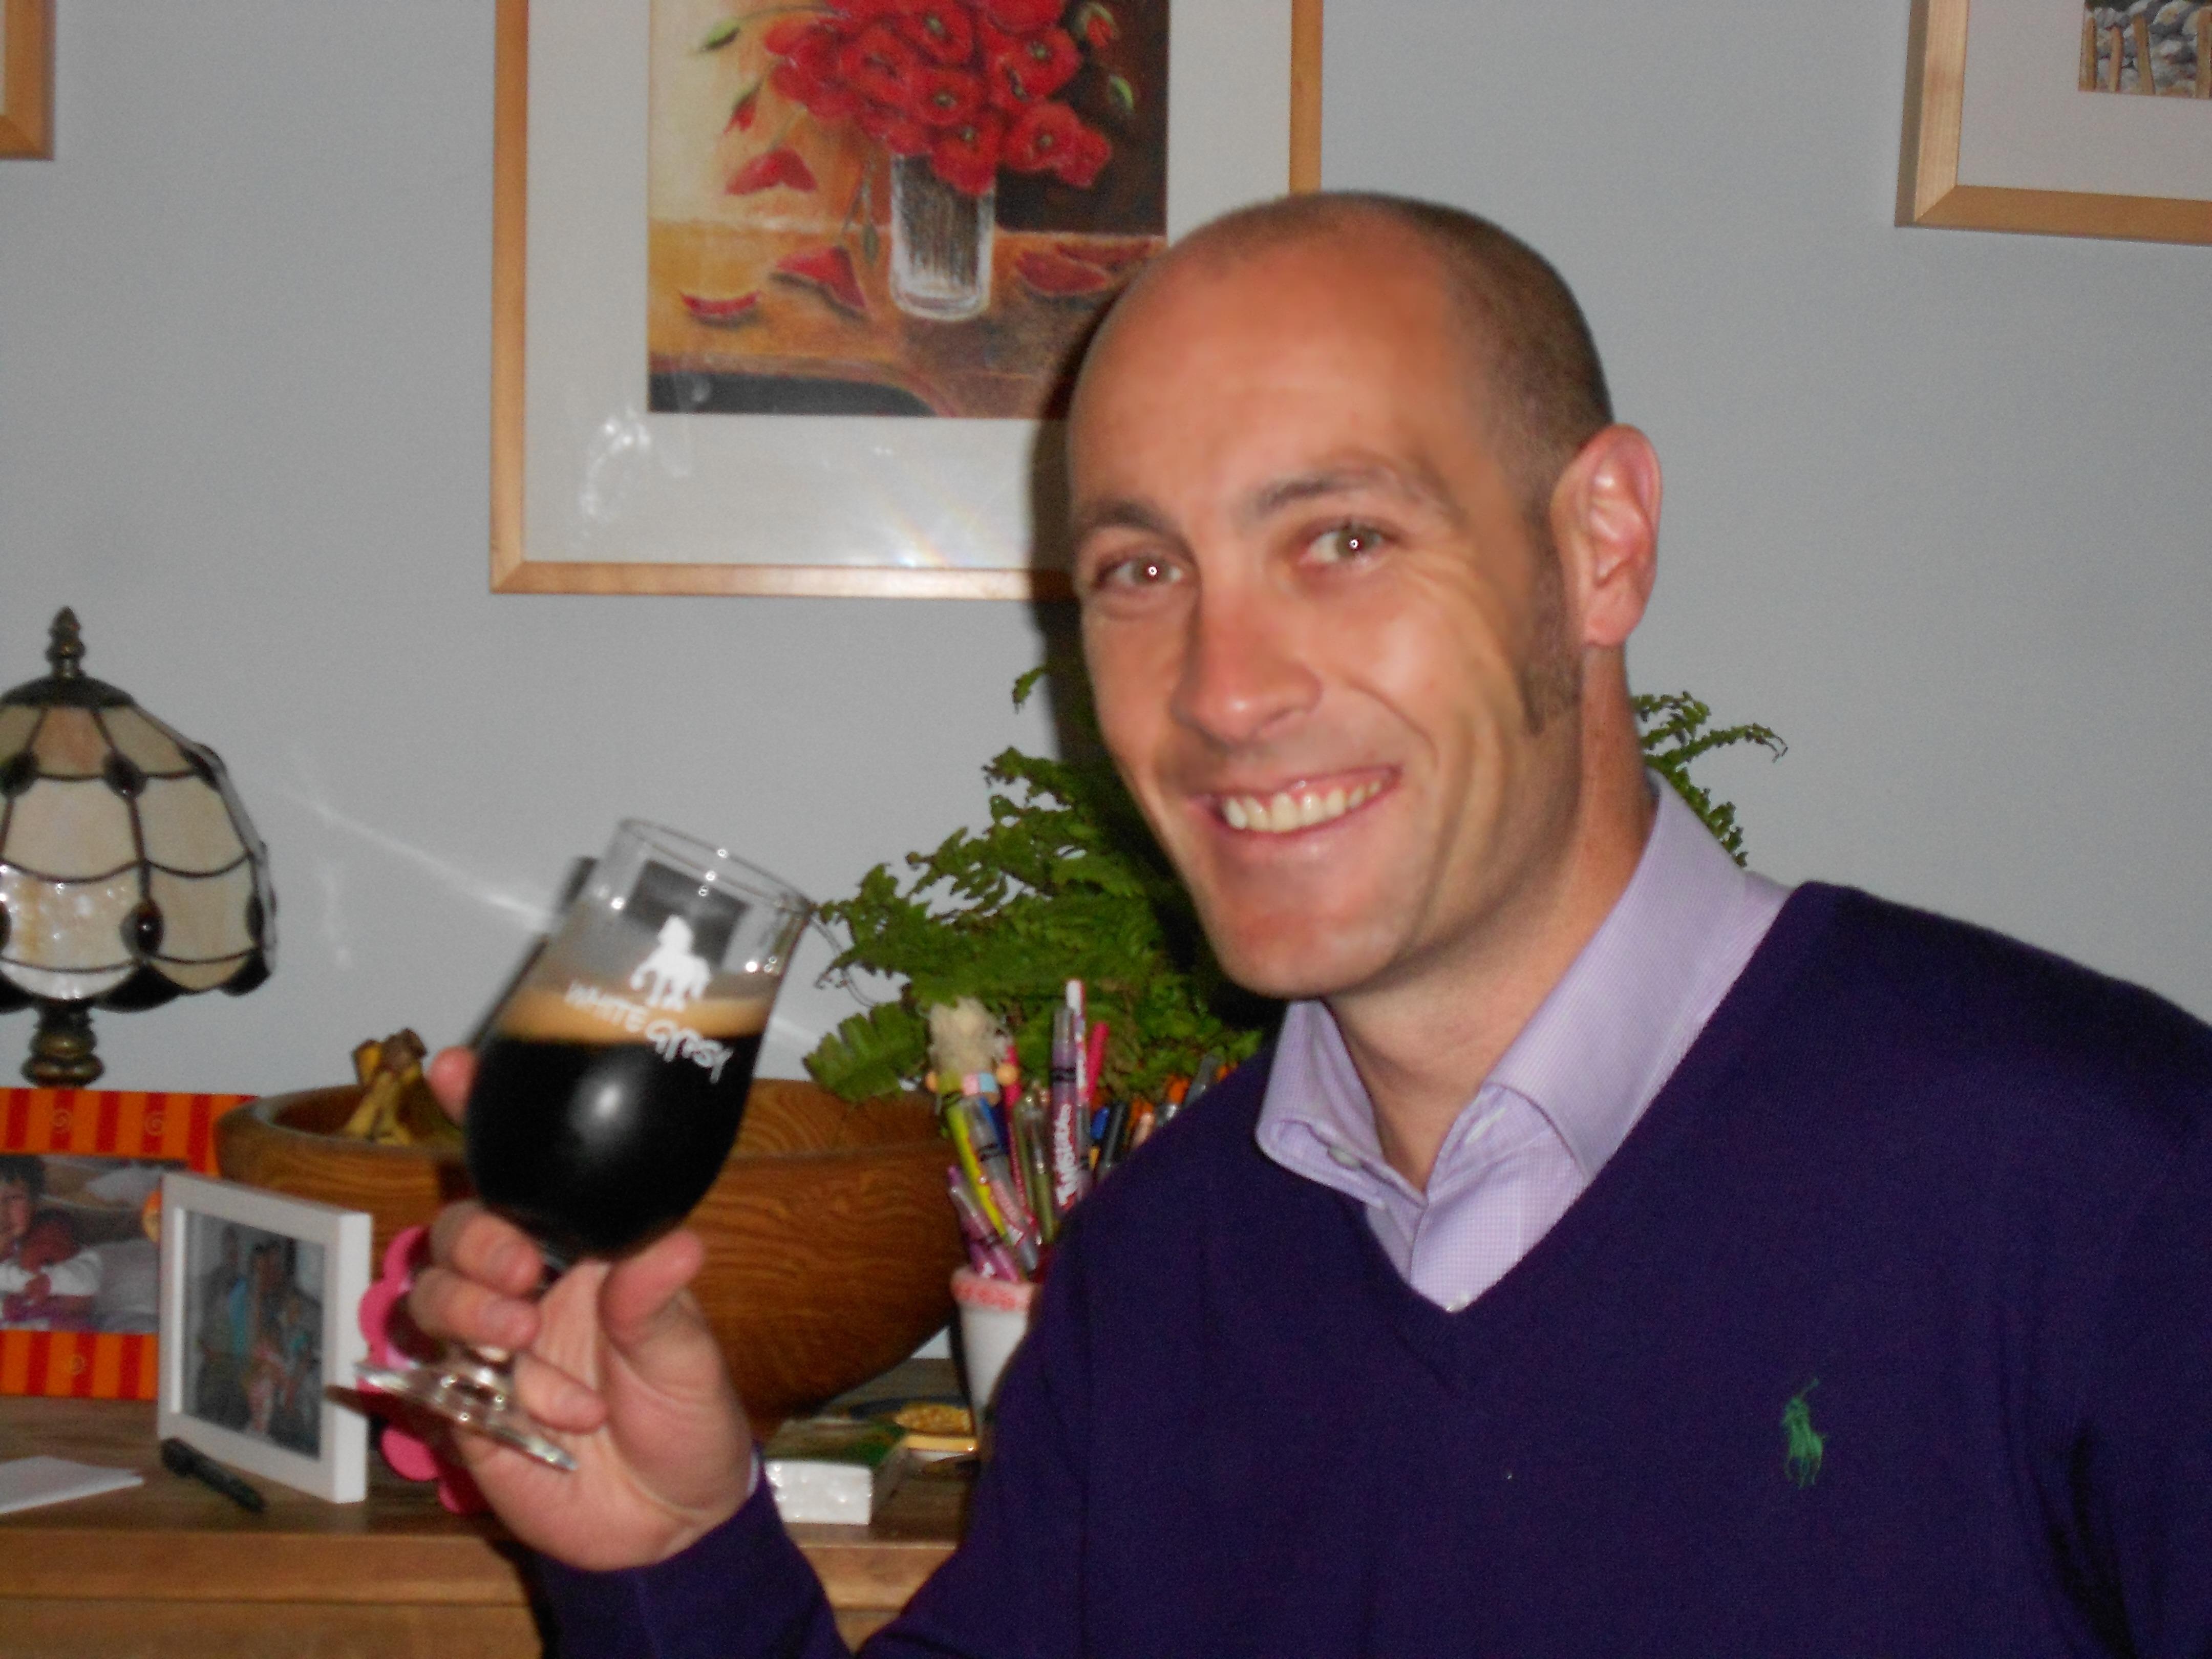 Philip Tavey, Dublin, Ireland<br>Accredited: 1st November 2012